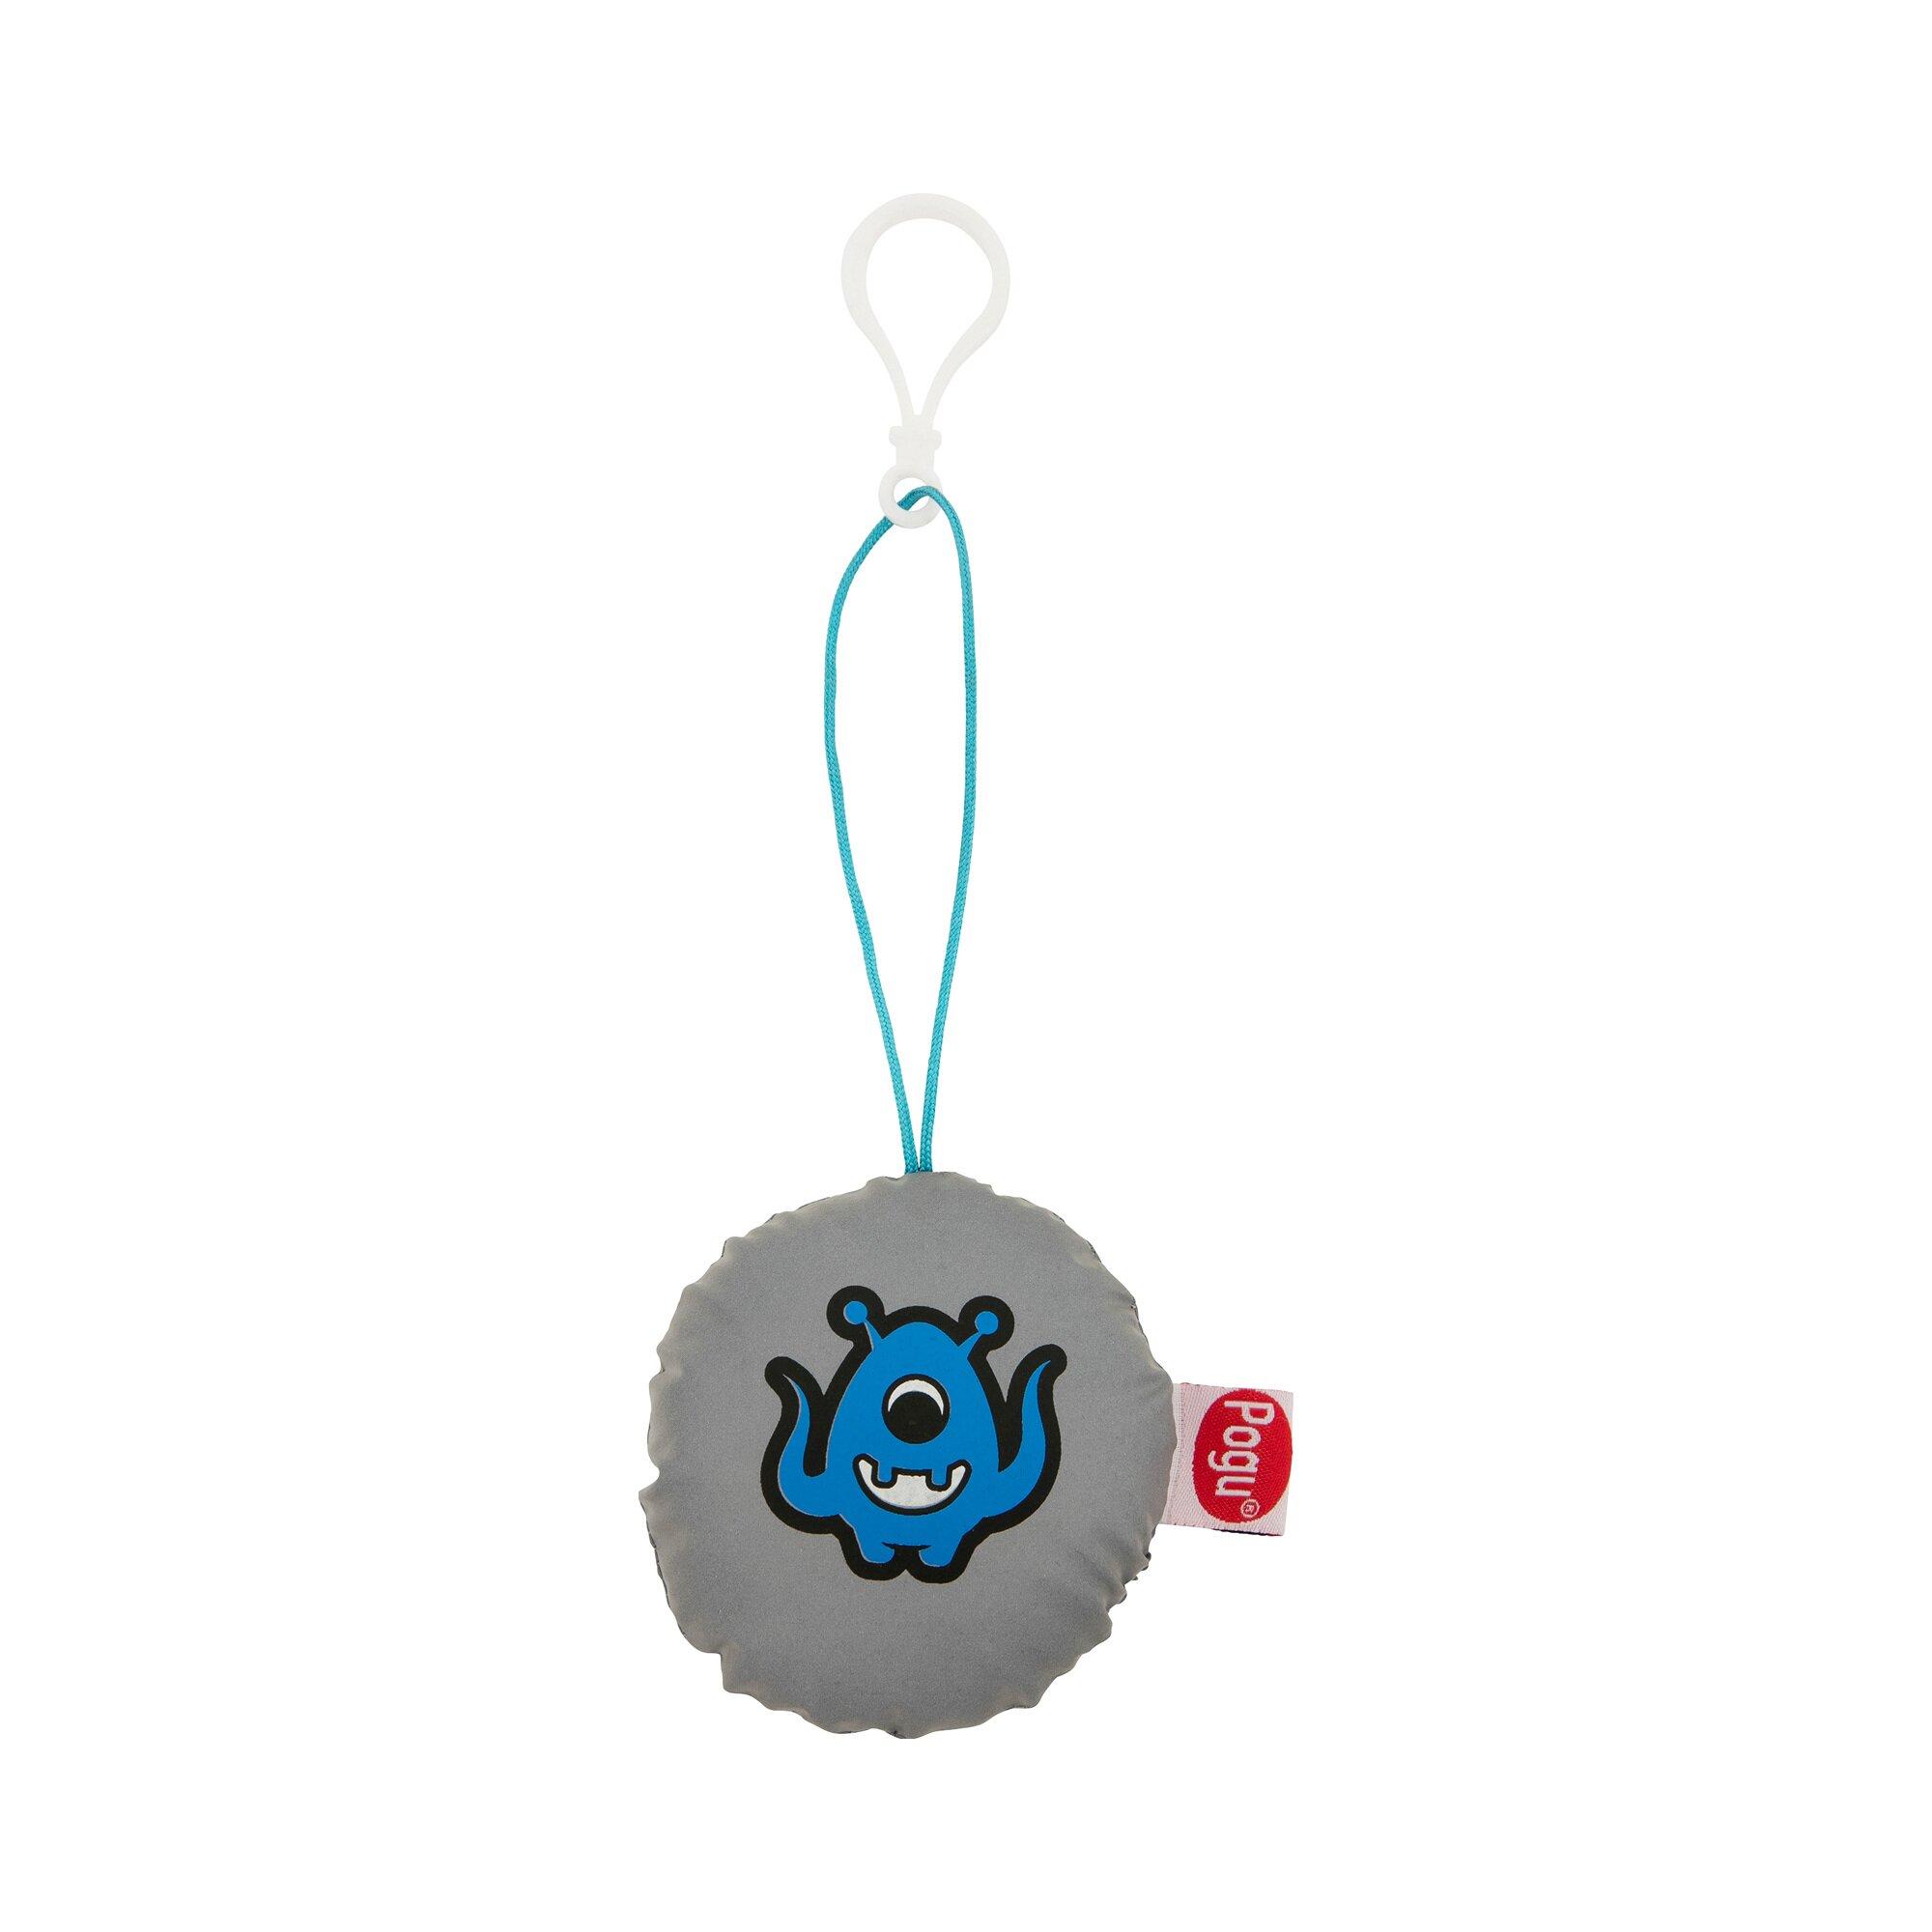 pogu-reflektor-geschenkset-5in1-mehrfarbig